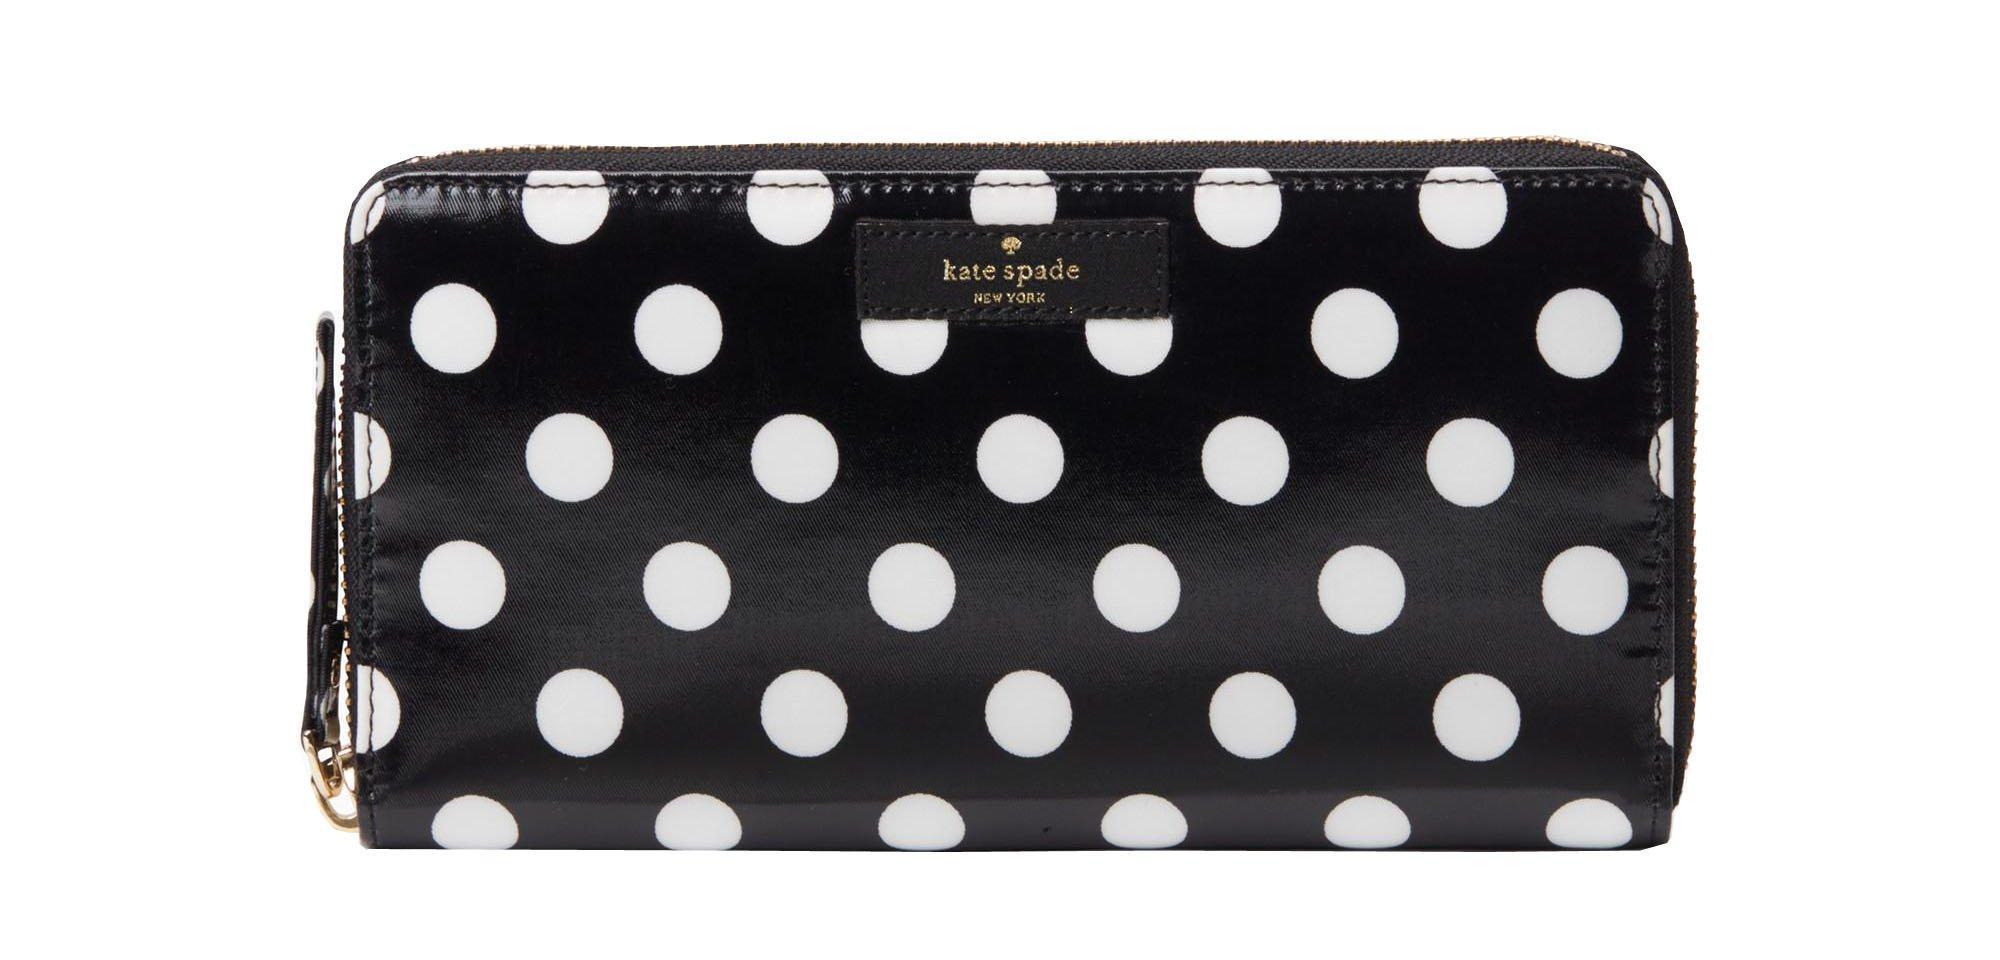 Kate Spade daycation neda wallet, black/cream dot